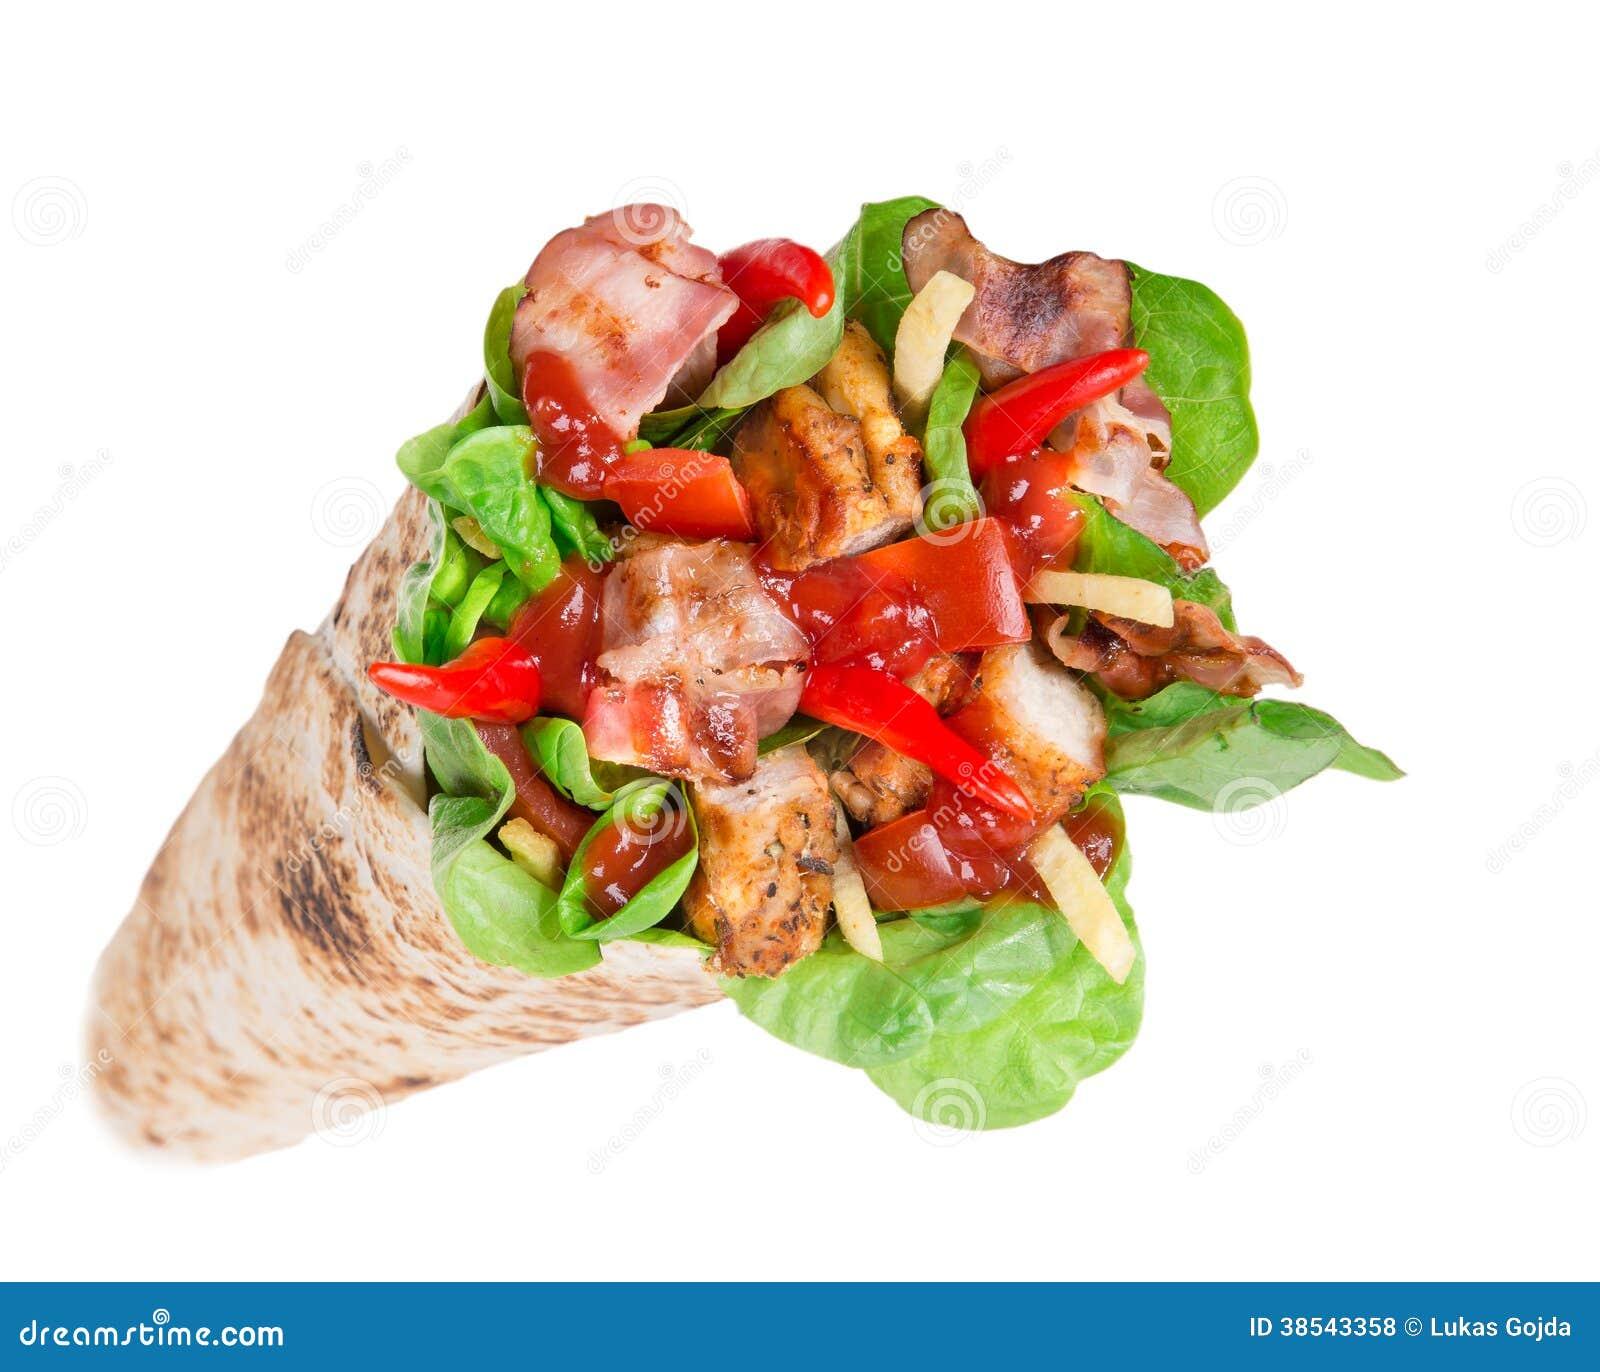 Fast Food Chicken Tortilla Wrap